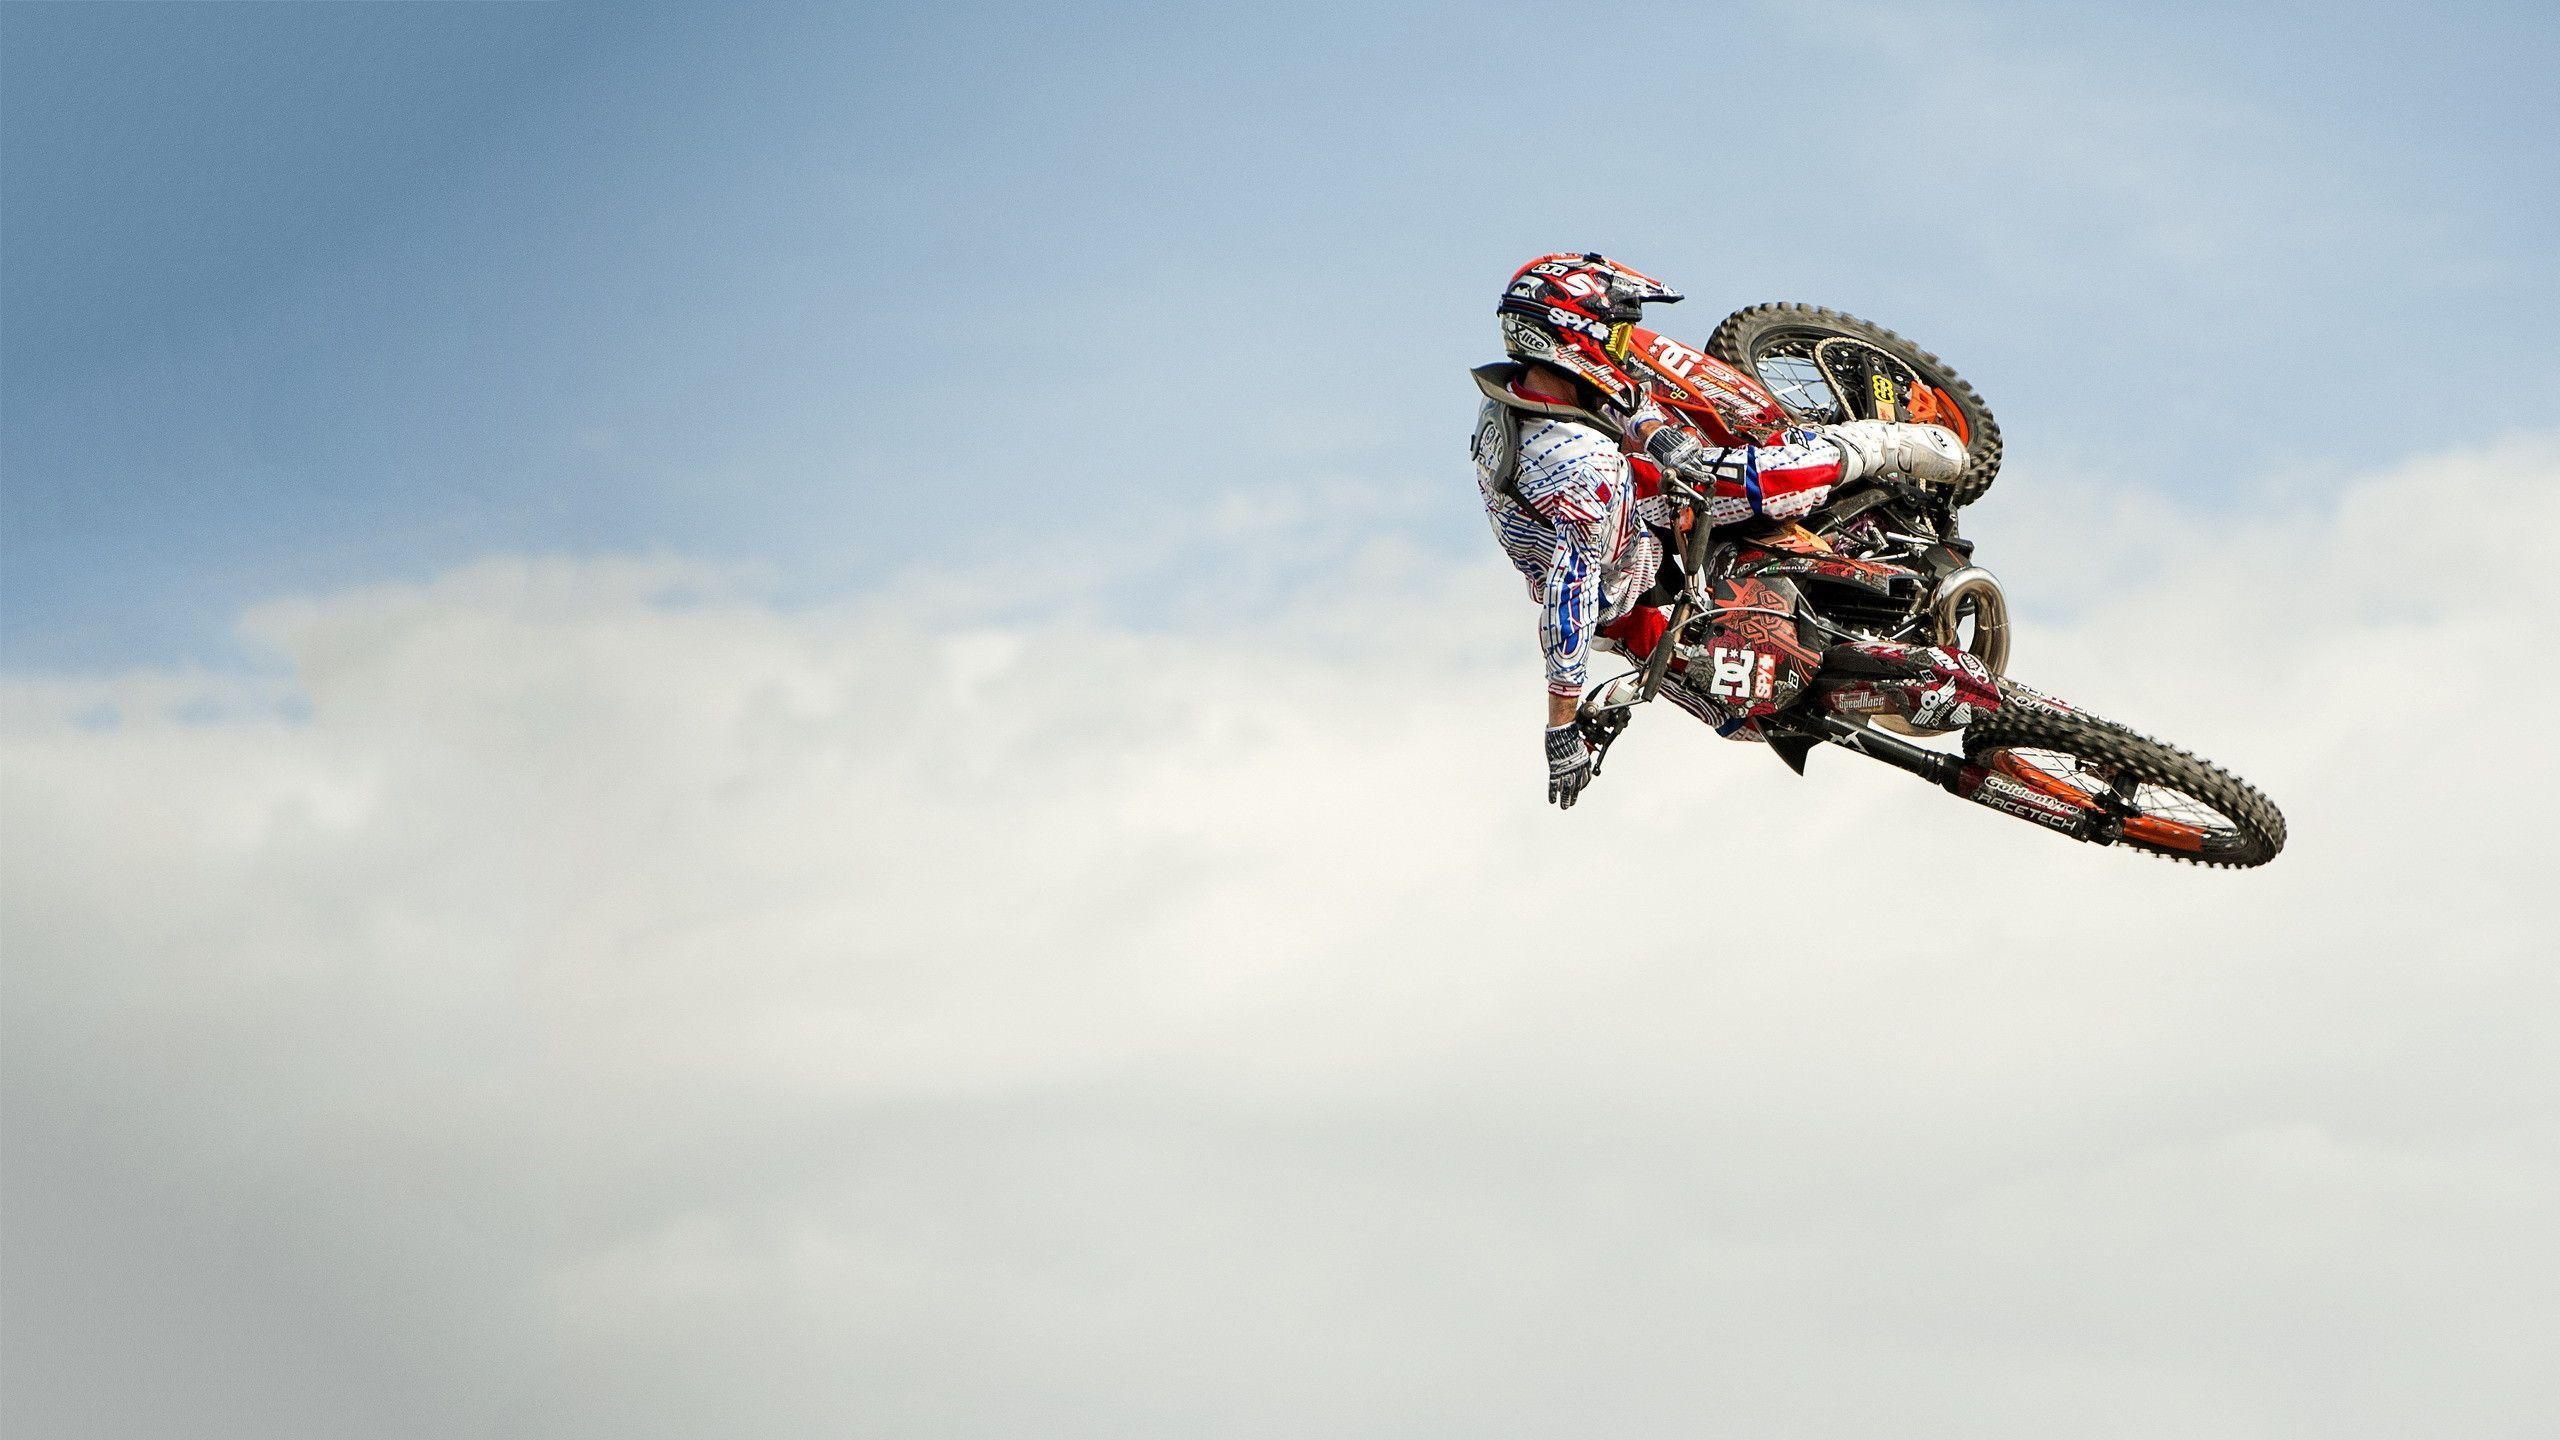 Motocross Wallpapers - Wallpaper Cave